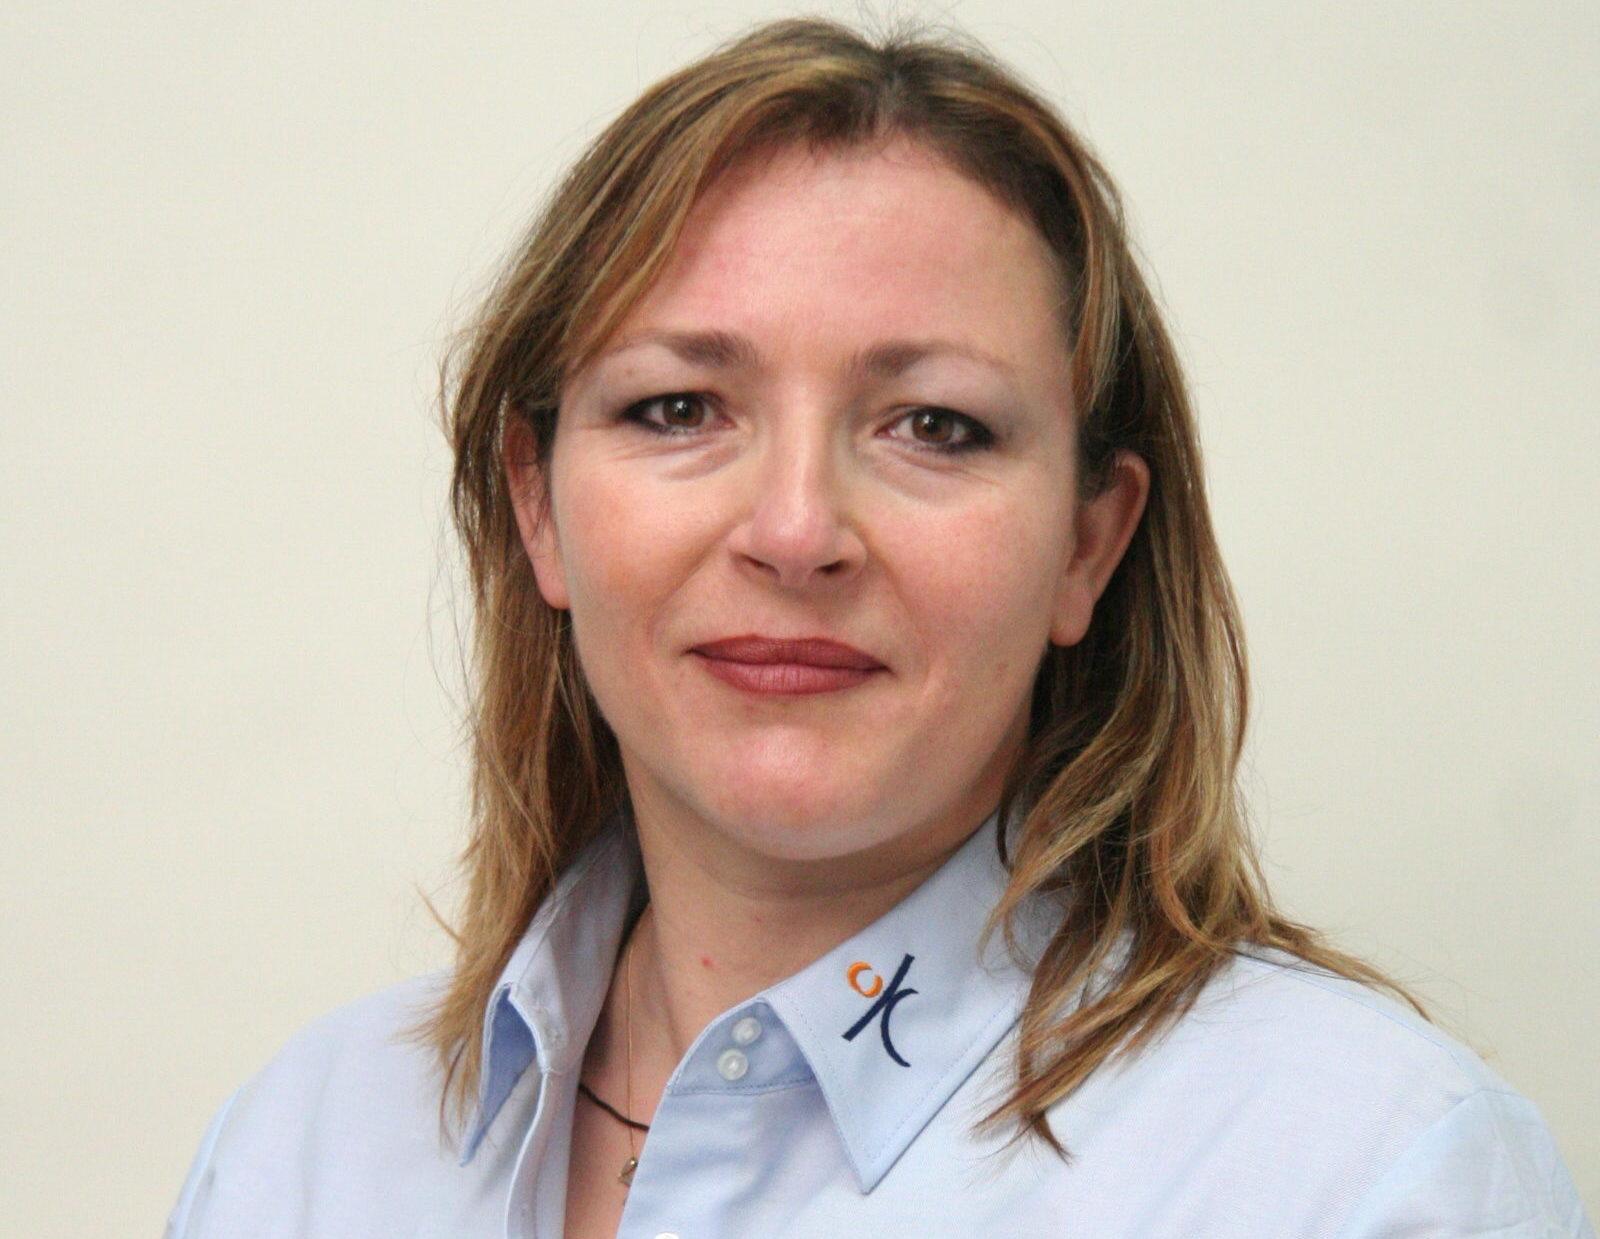 Jennifer Follmann